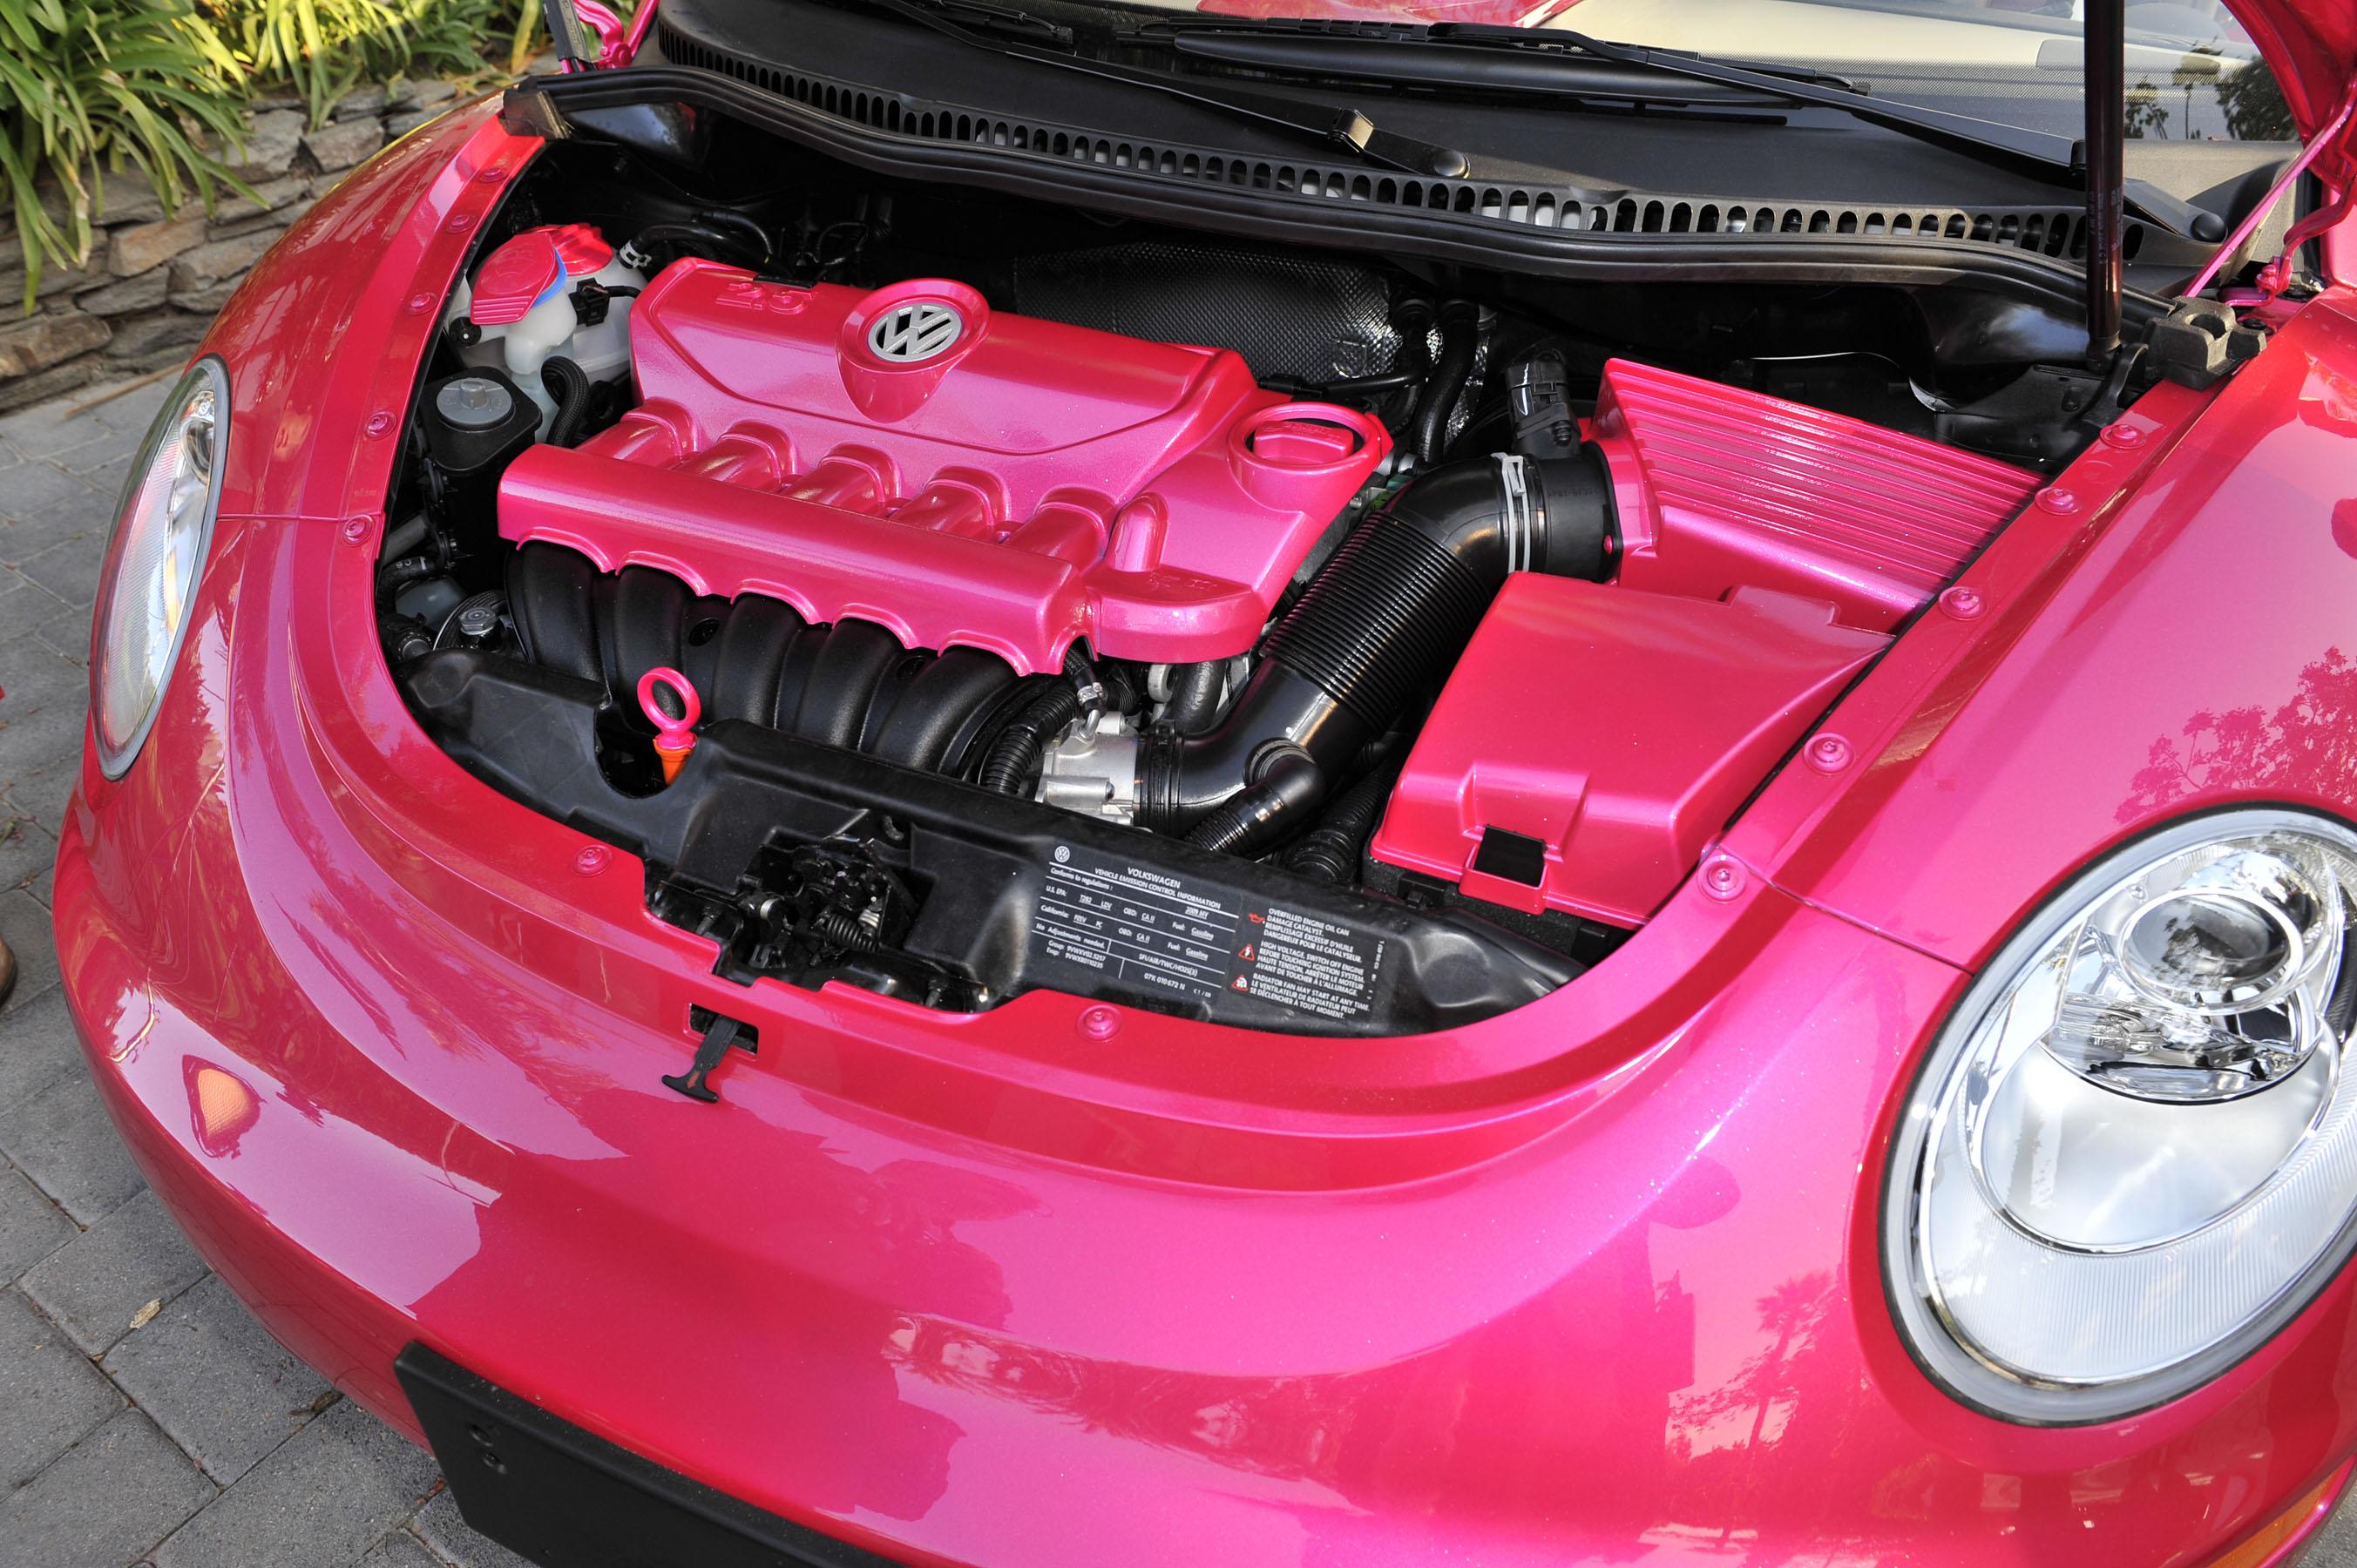 co cars swansea beetle for uk used local sale pink volkswagen in gorseinon motors